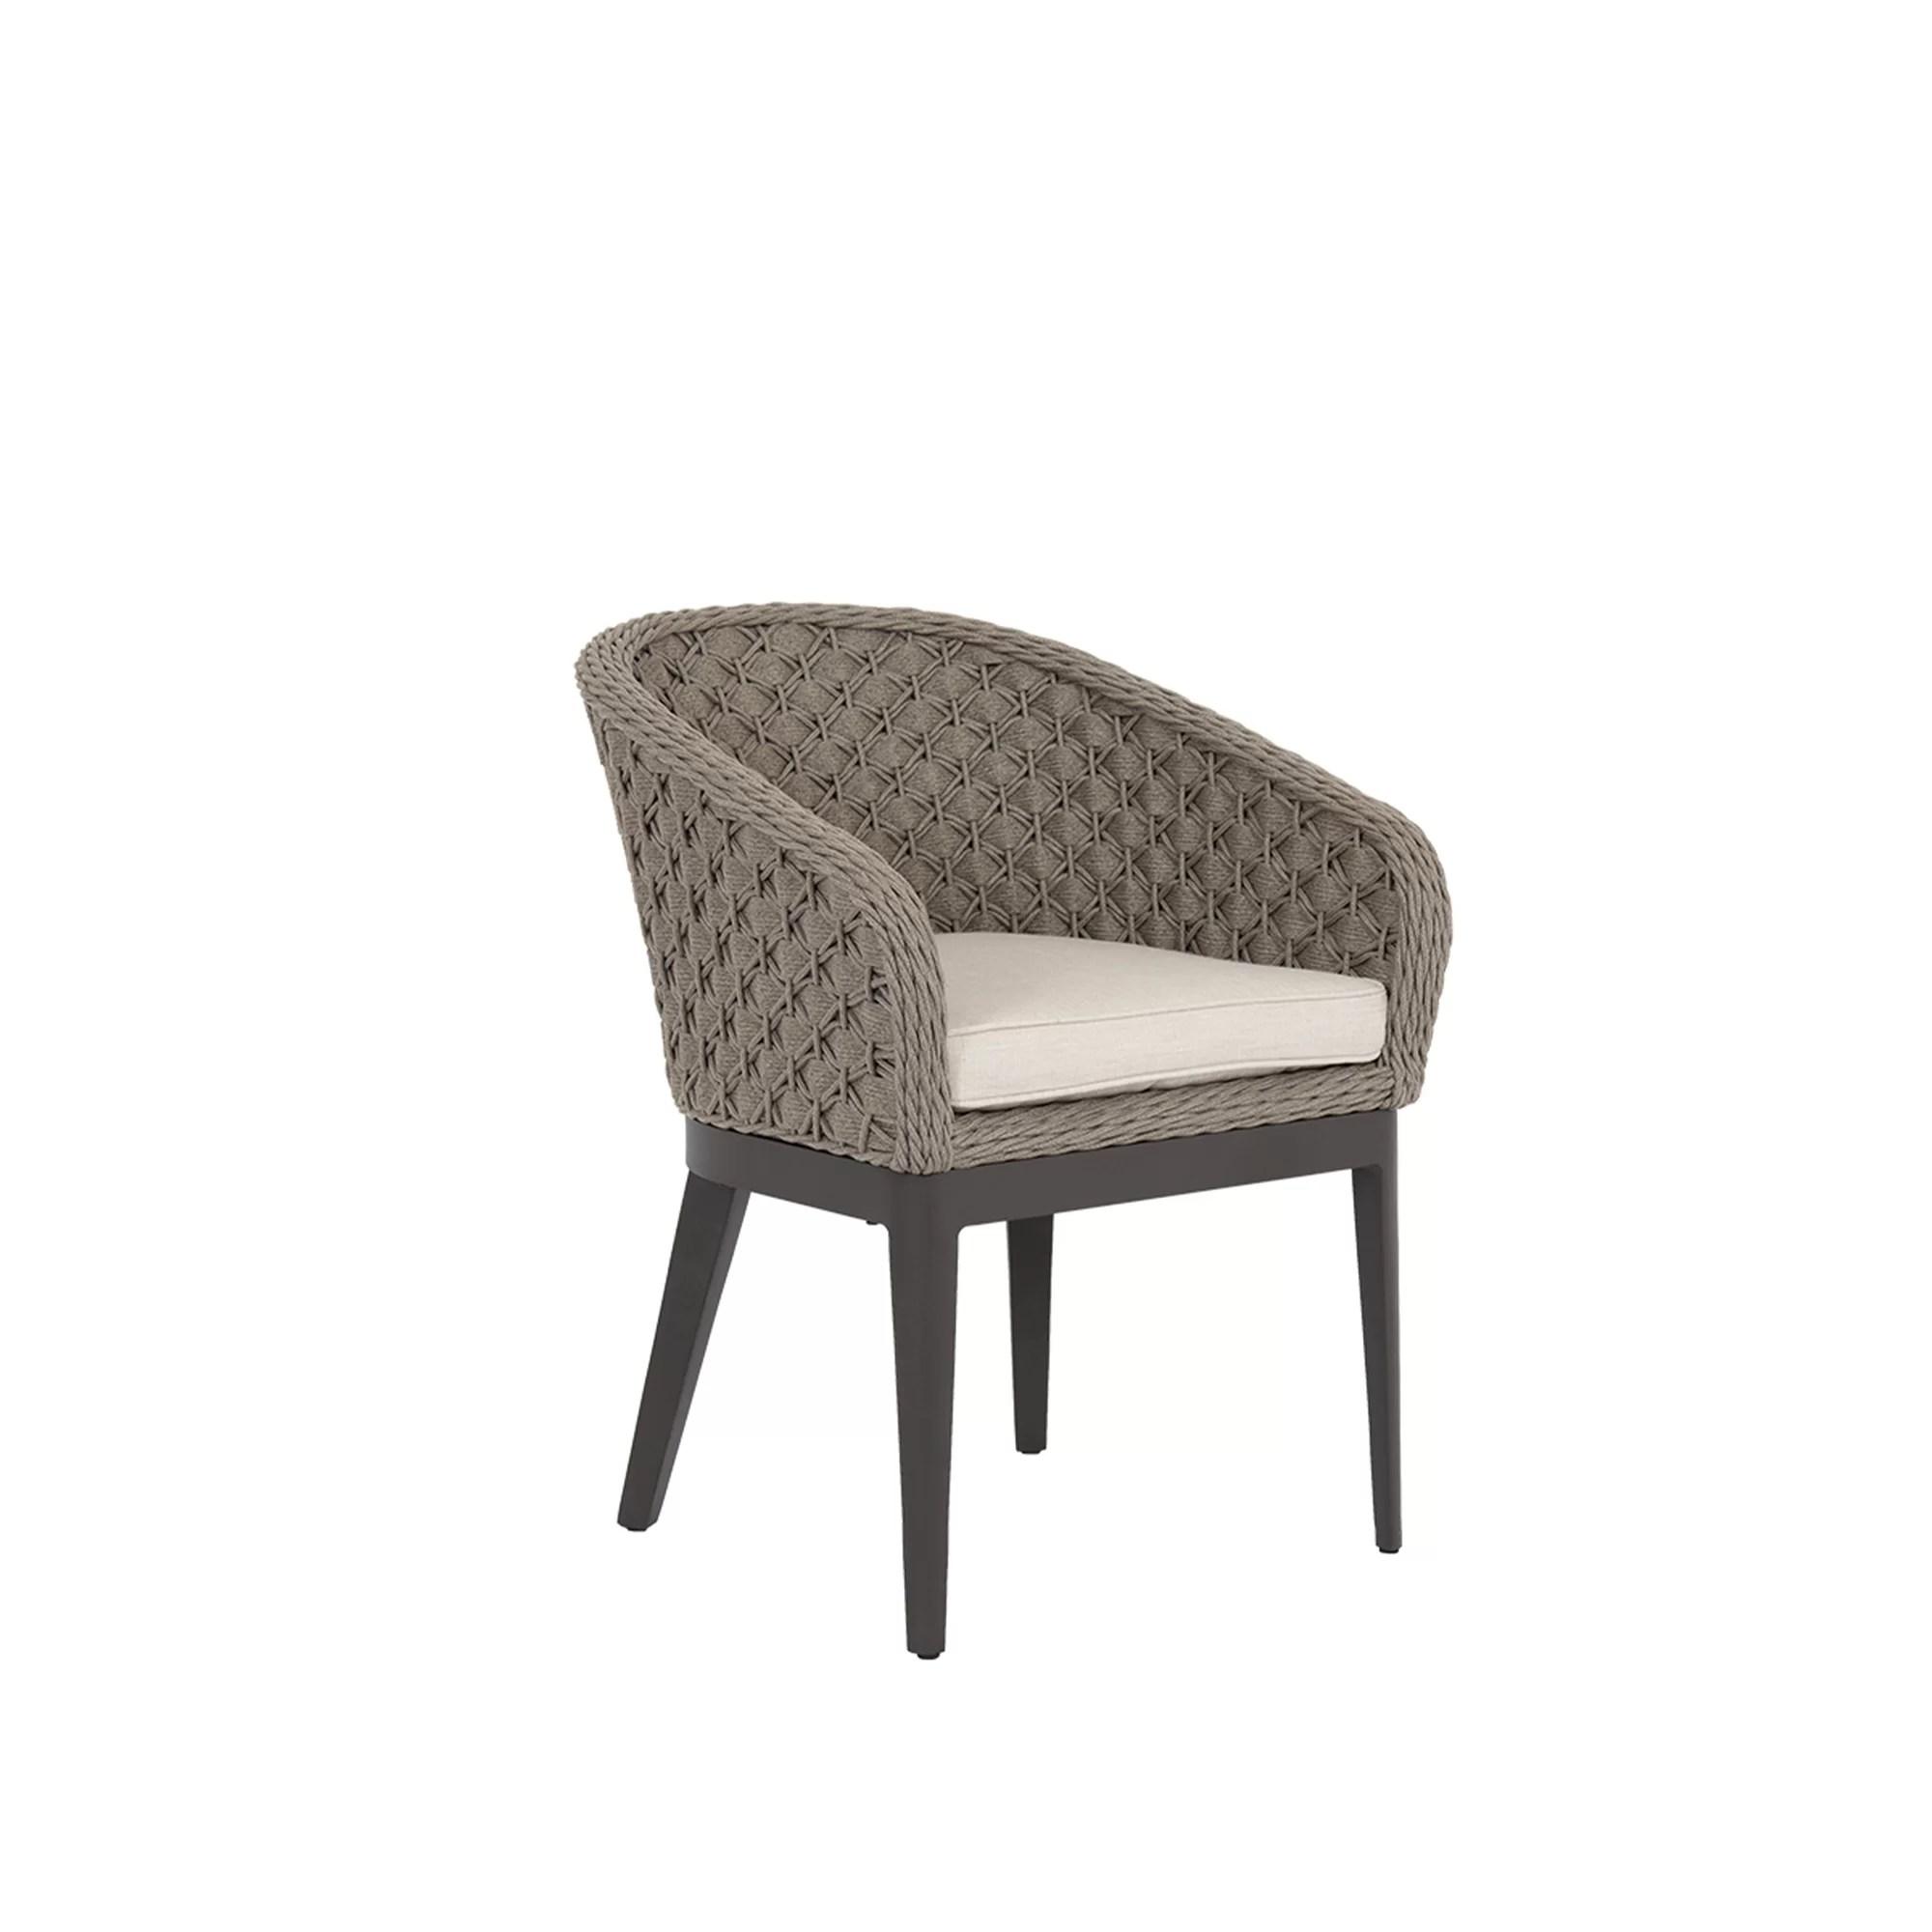 aberdeen patio dining chair with sunbrella cushions